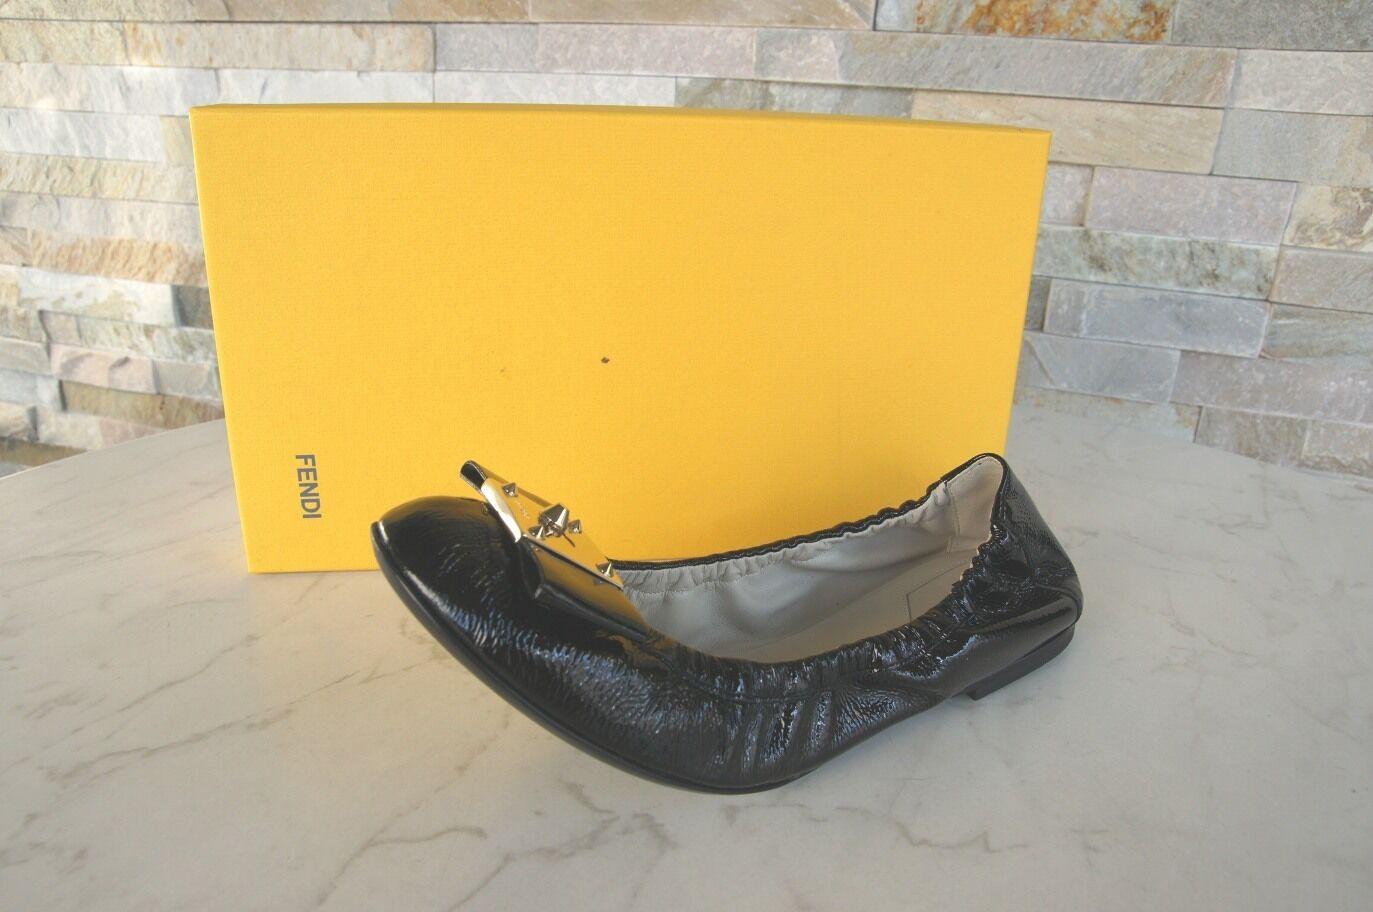 Luxus FENDI Gr 39 Lack Slipper Ballerinas Schuhe Schuhe Schuhe schwarz schwarz NEU 947efa